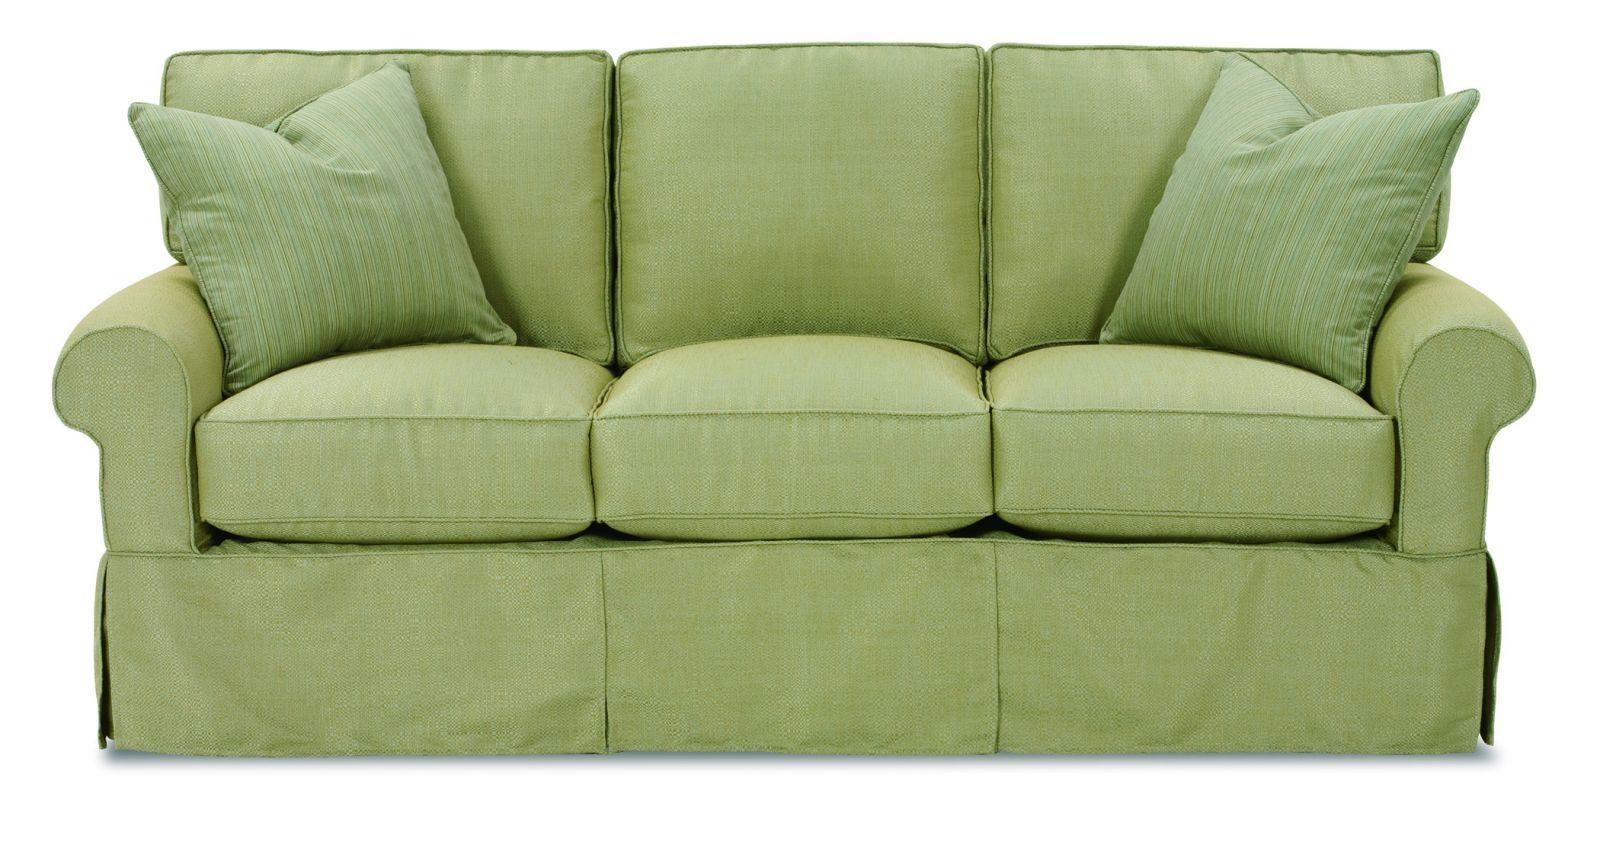 Rp Green Sofa Cover